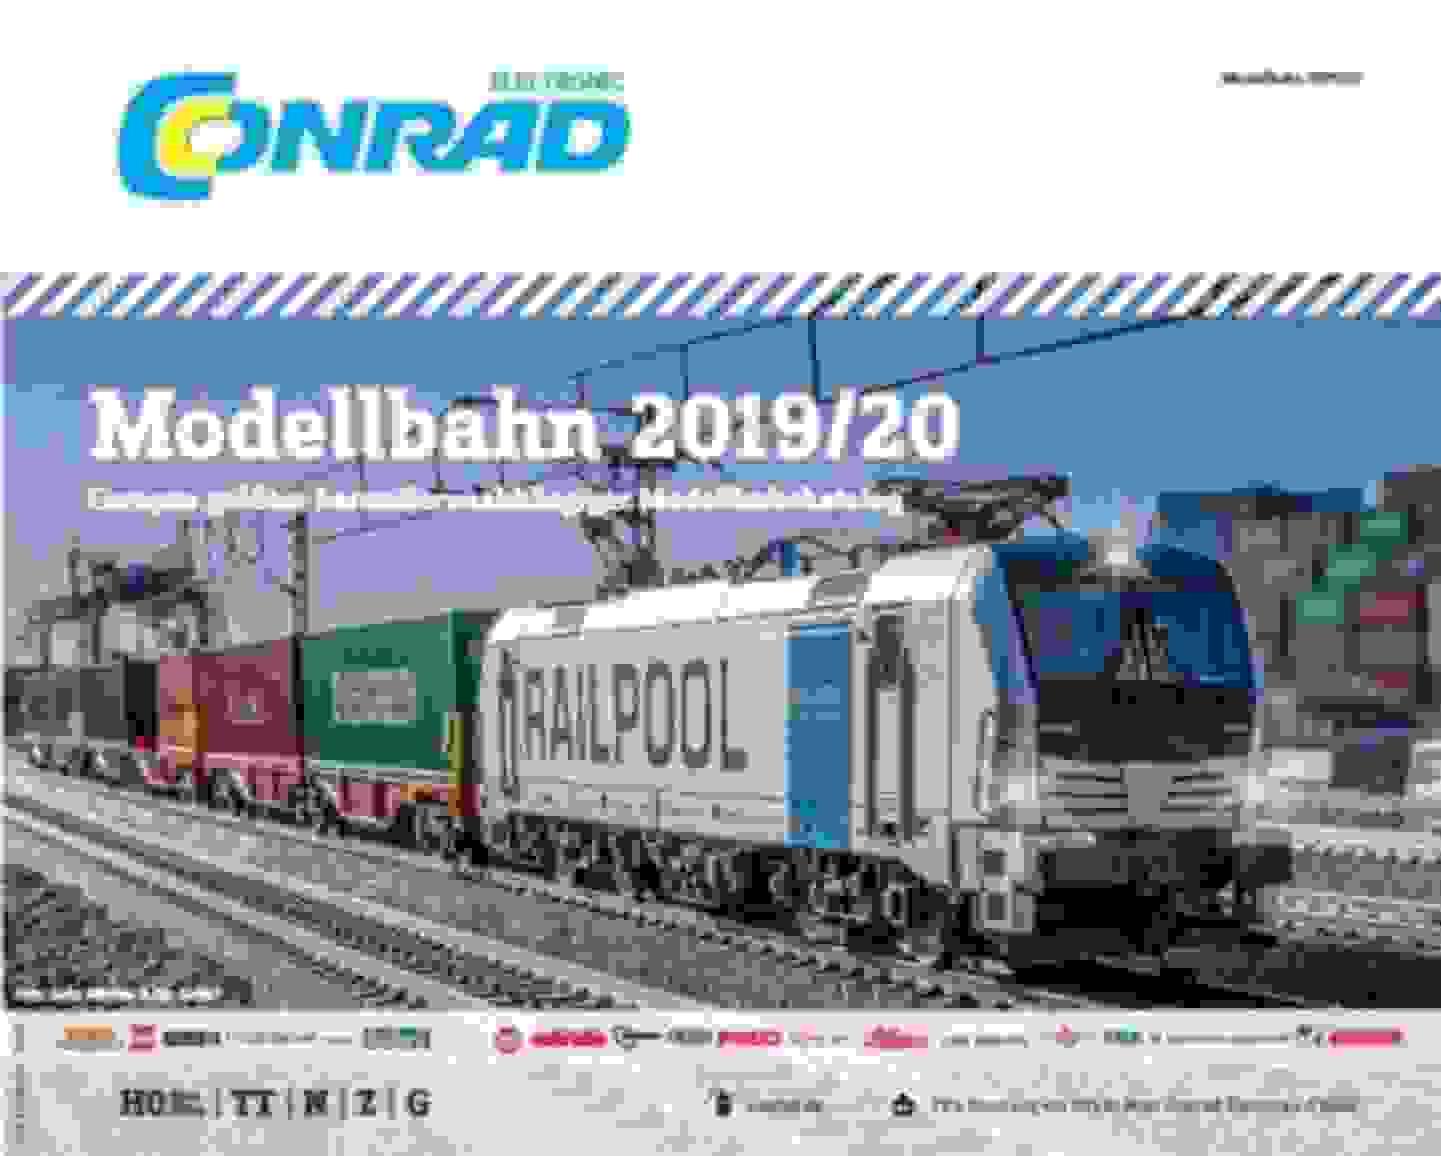 Modellbahn Katalog